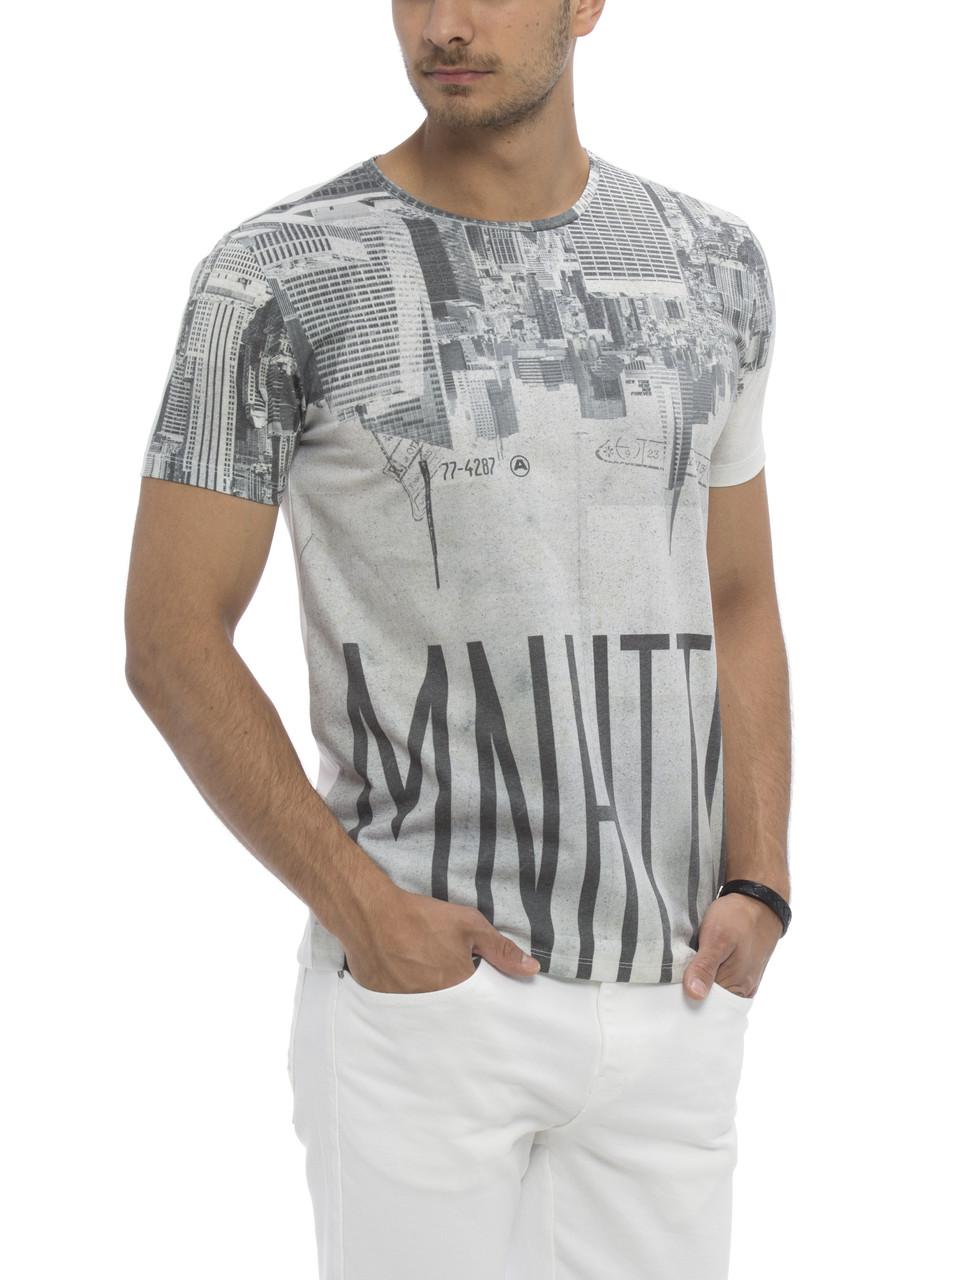 Белая мужская футболка Lc Waikiki / Лс Вайкики с надписью Manhattan